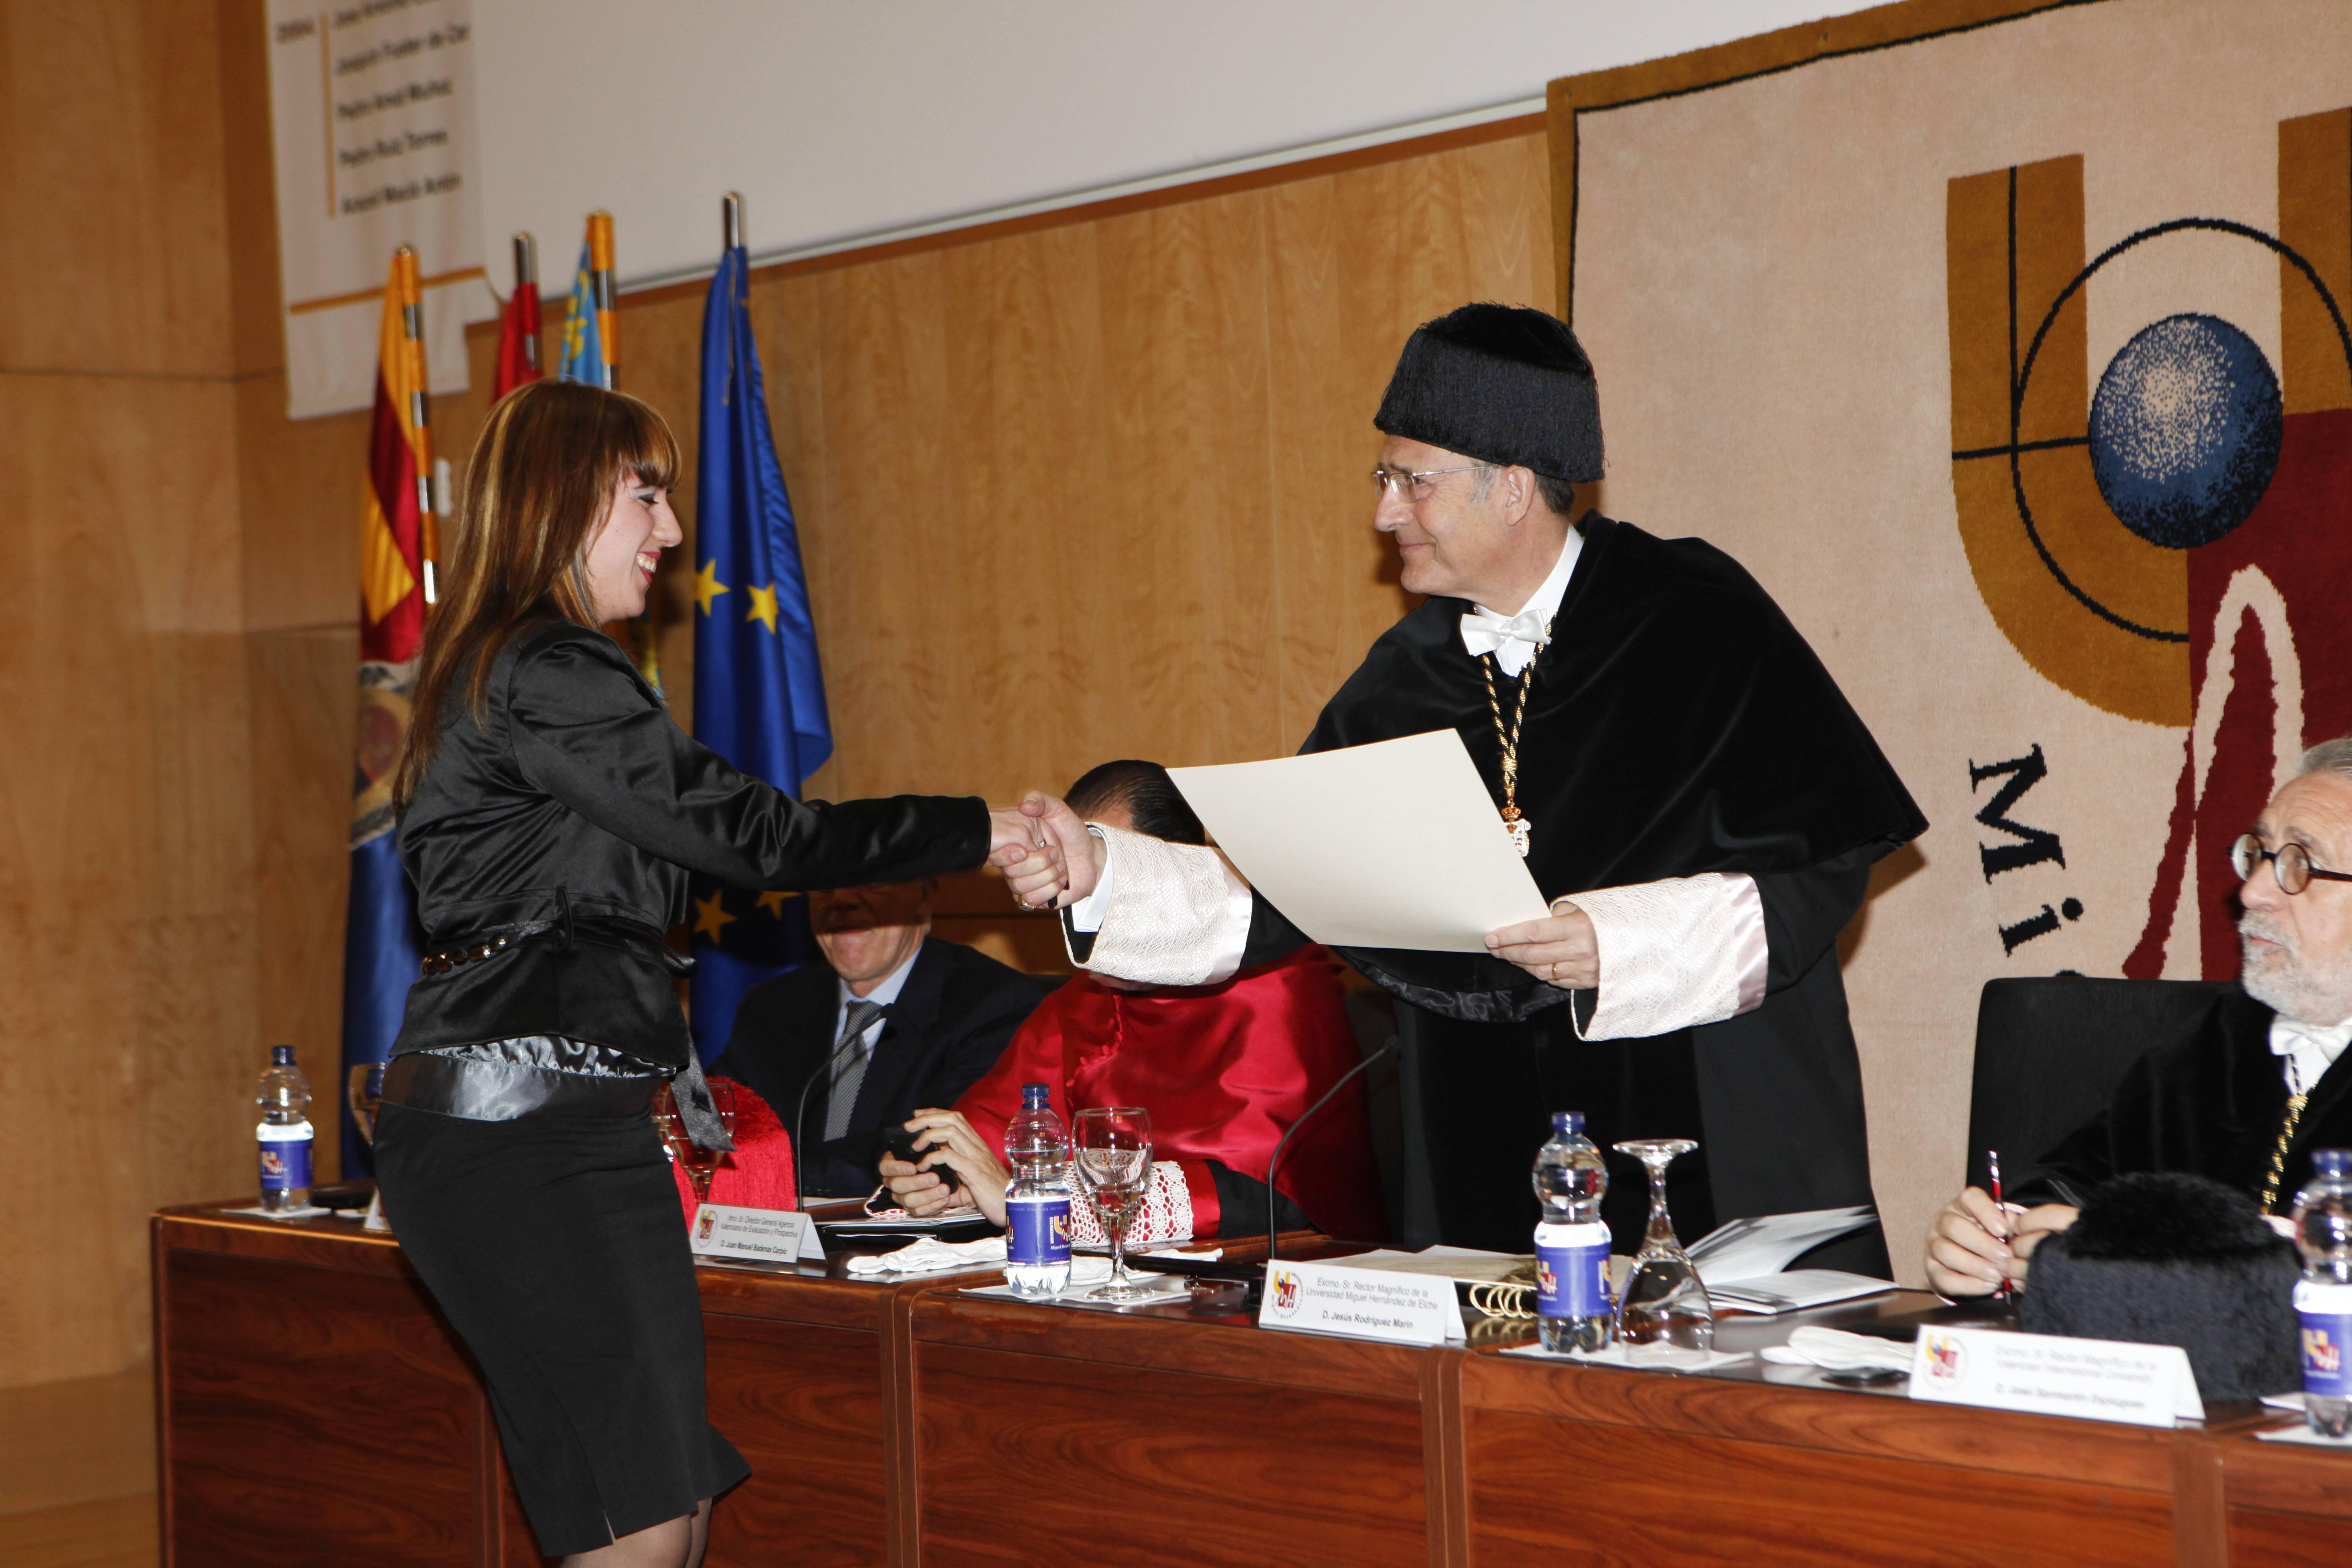 doctor-honoris-causa-luis-gamir_mg_0934.jpg